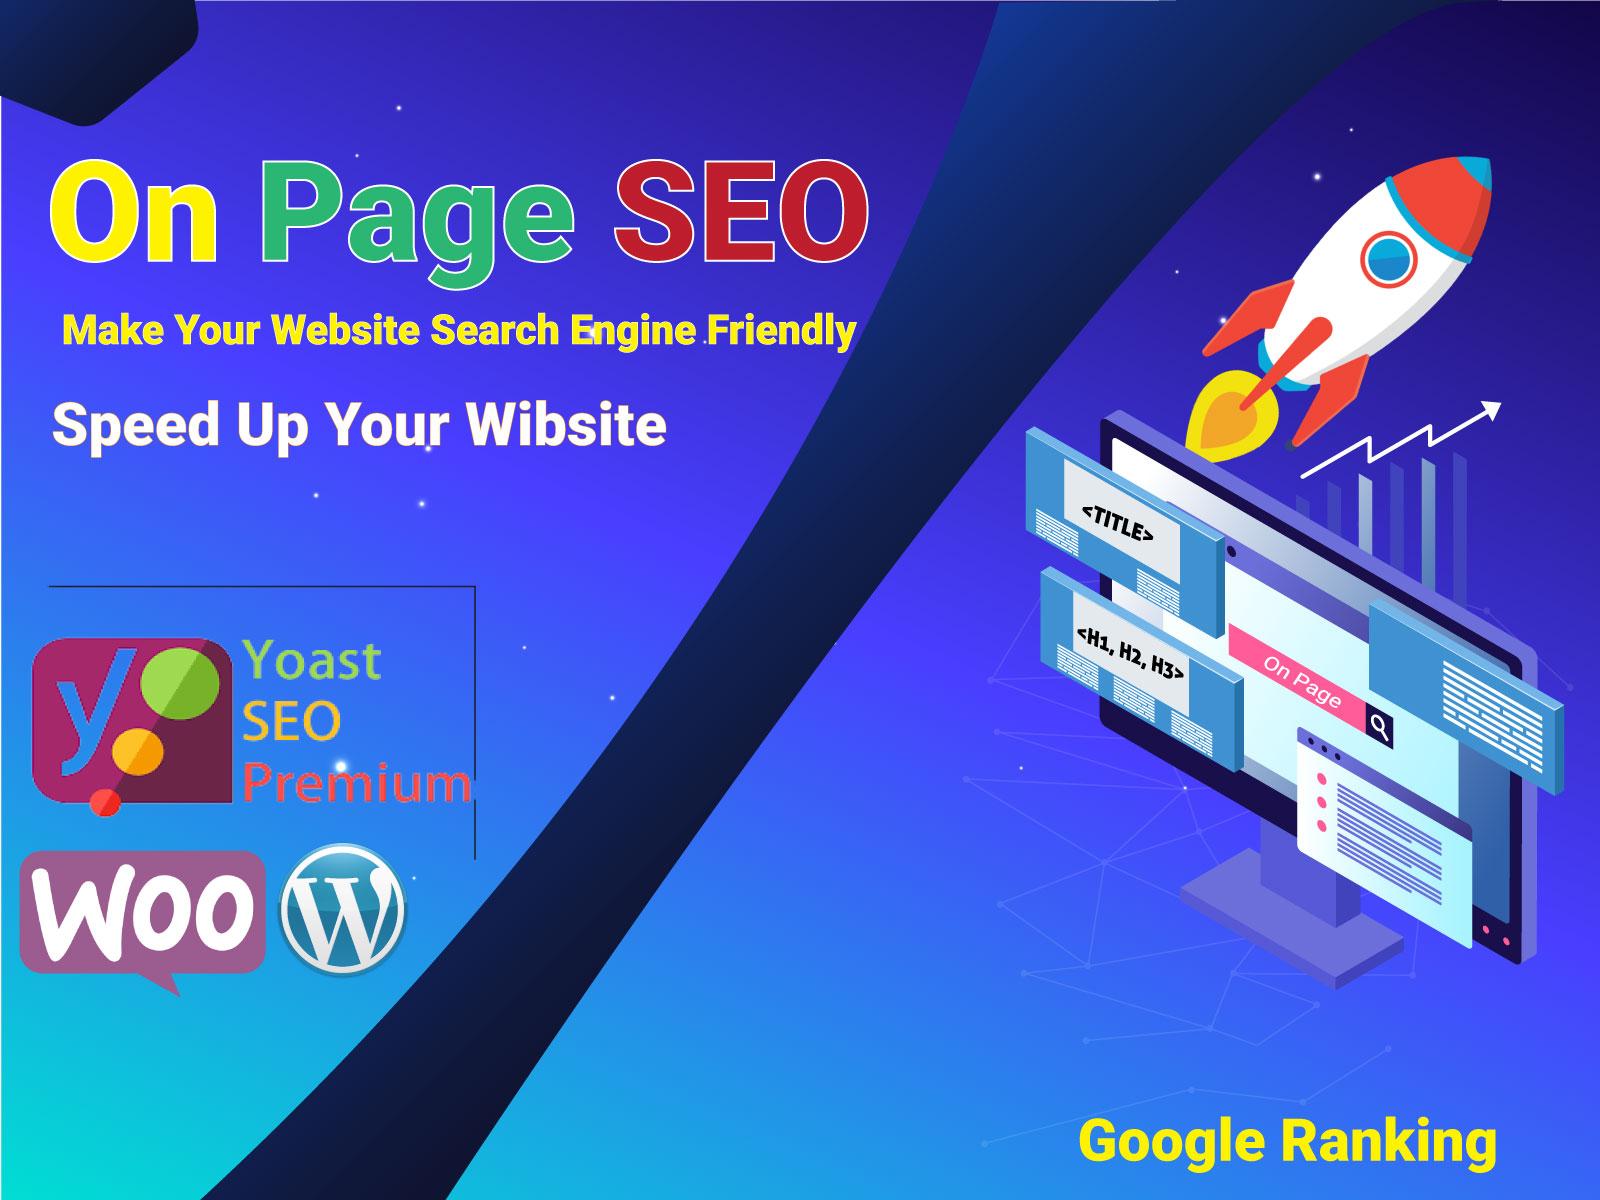 I will do on page SEO optimization of wordpress yoast for google ranking